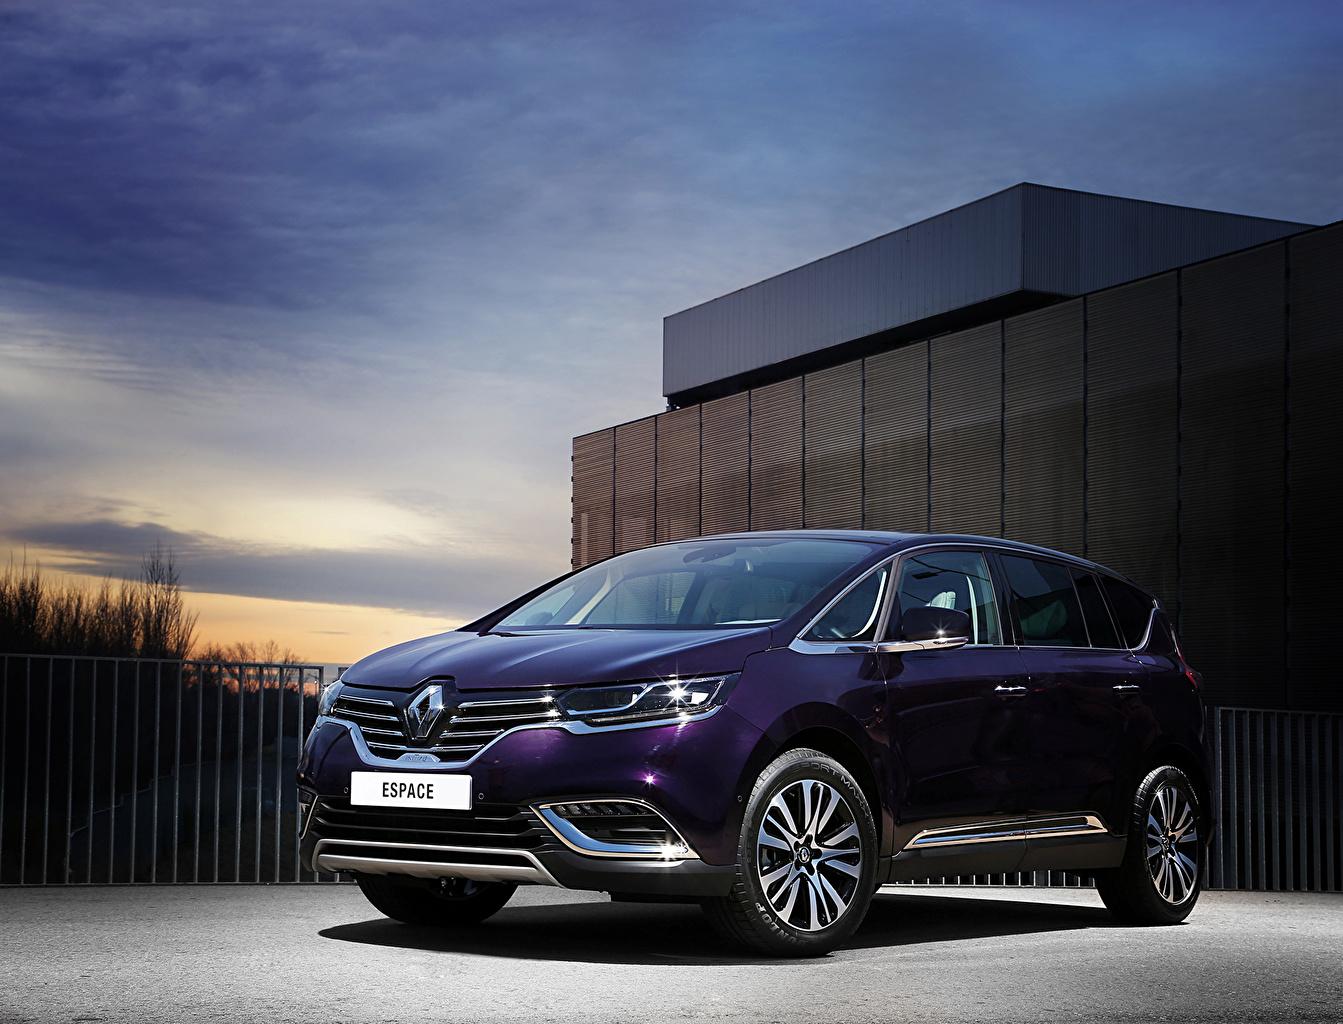 Image Renault 2015 Espace Initiale Paris Violet Metallic automobile Cars auto